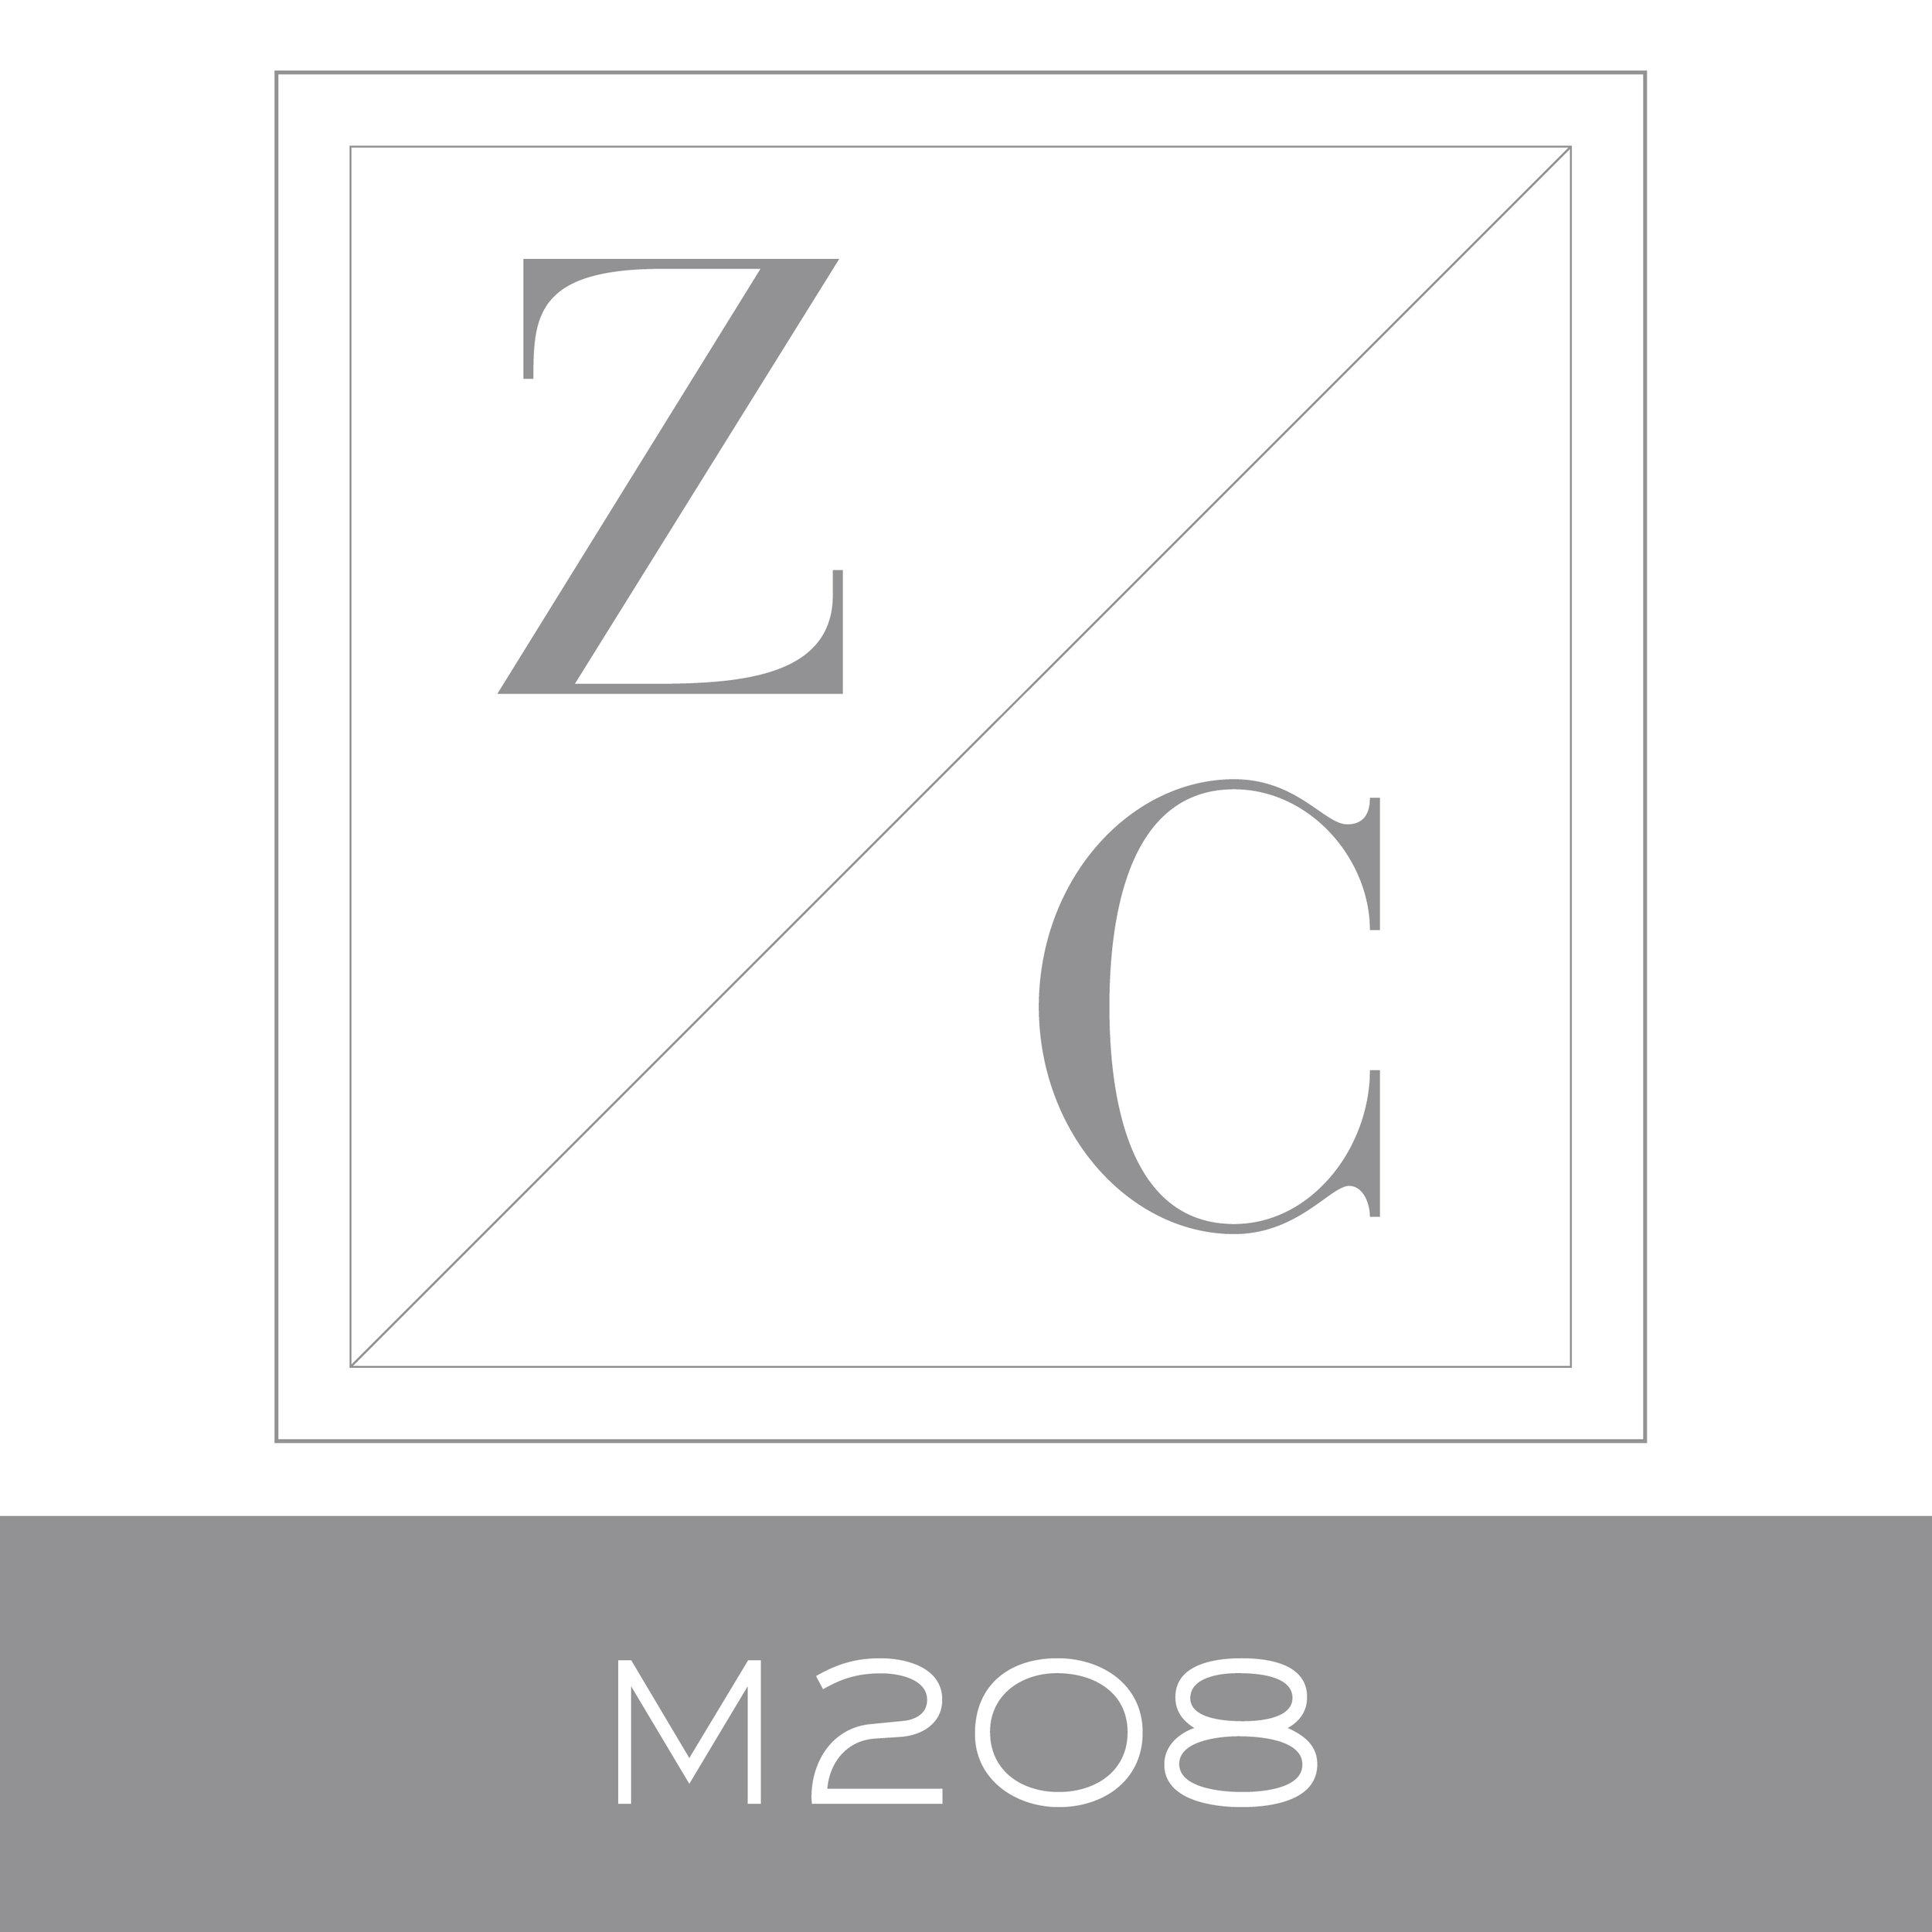 M208.jpg